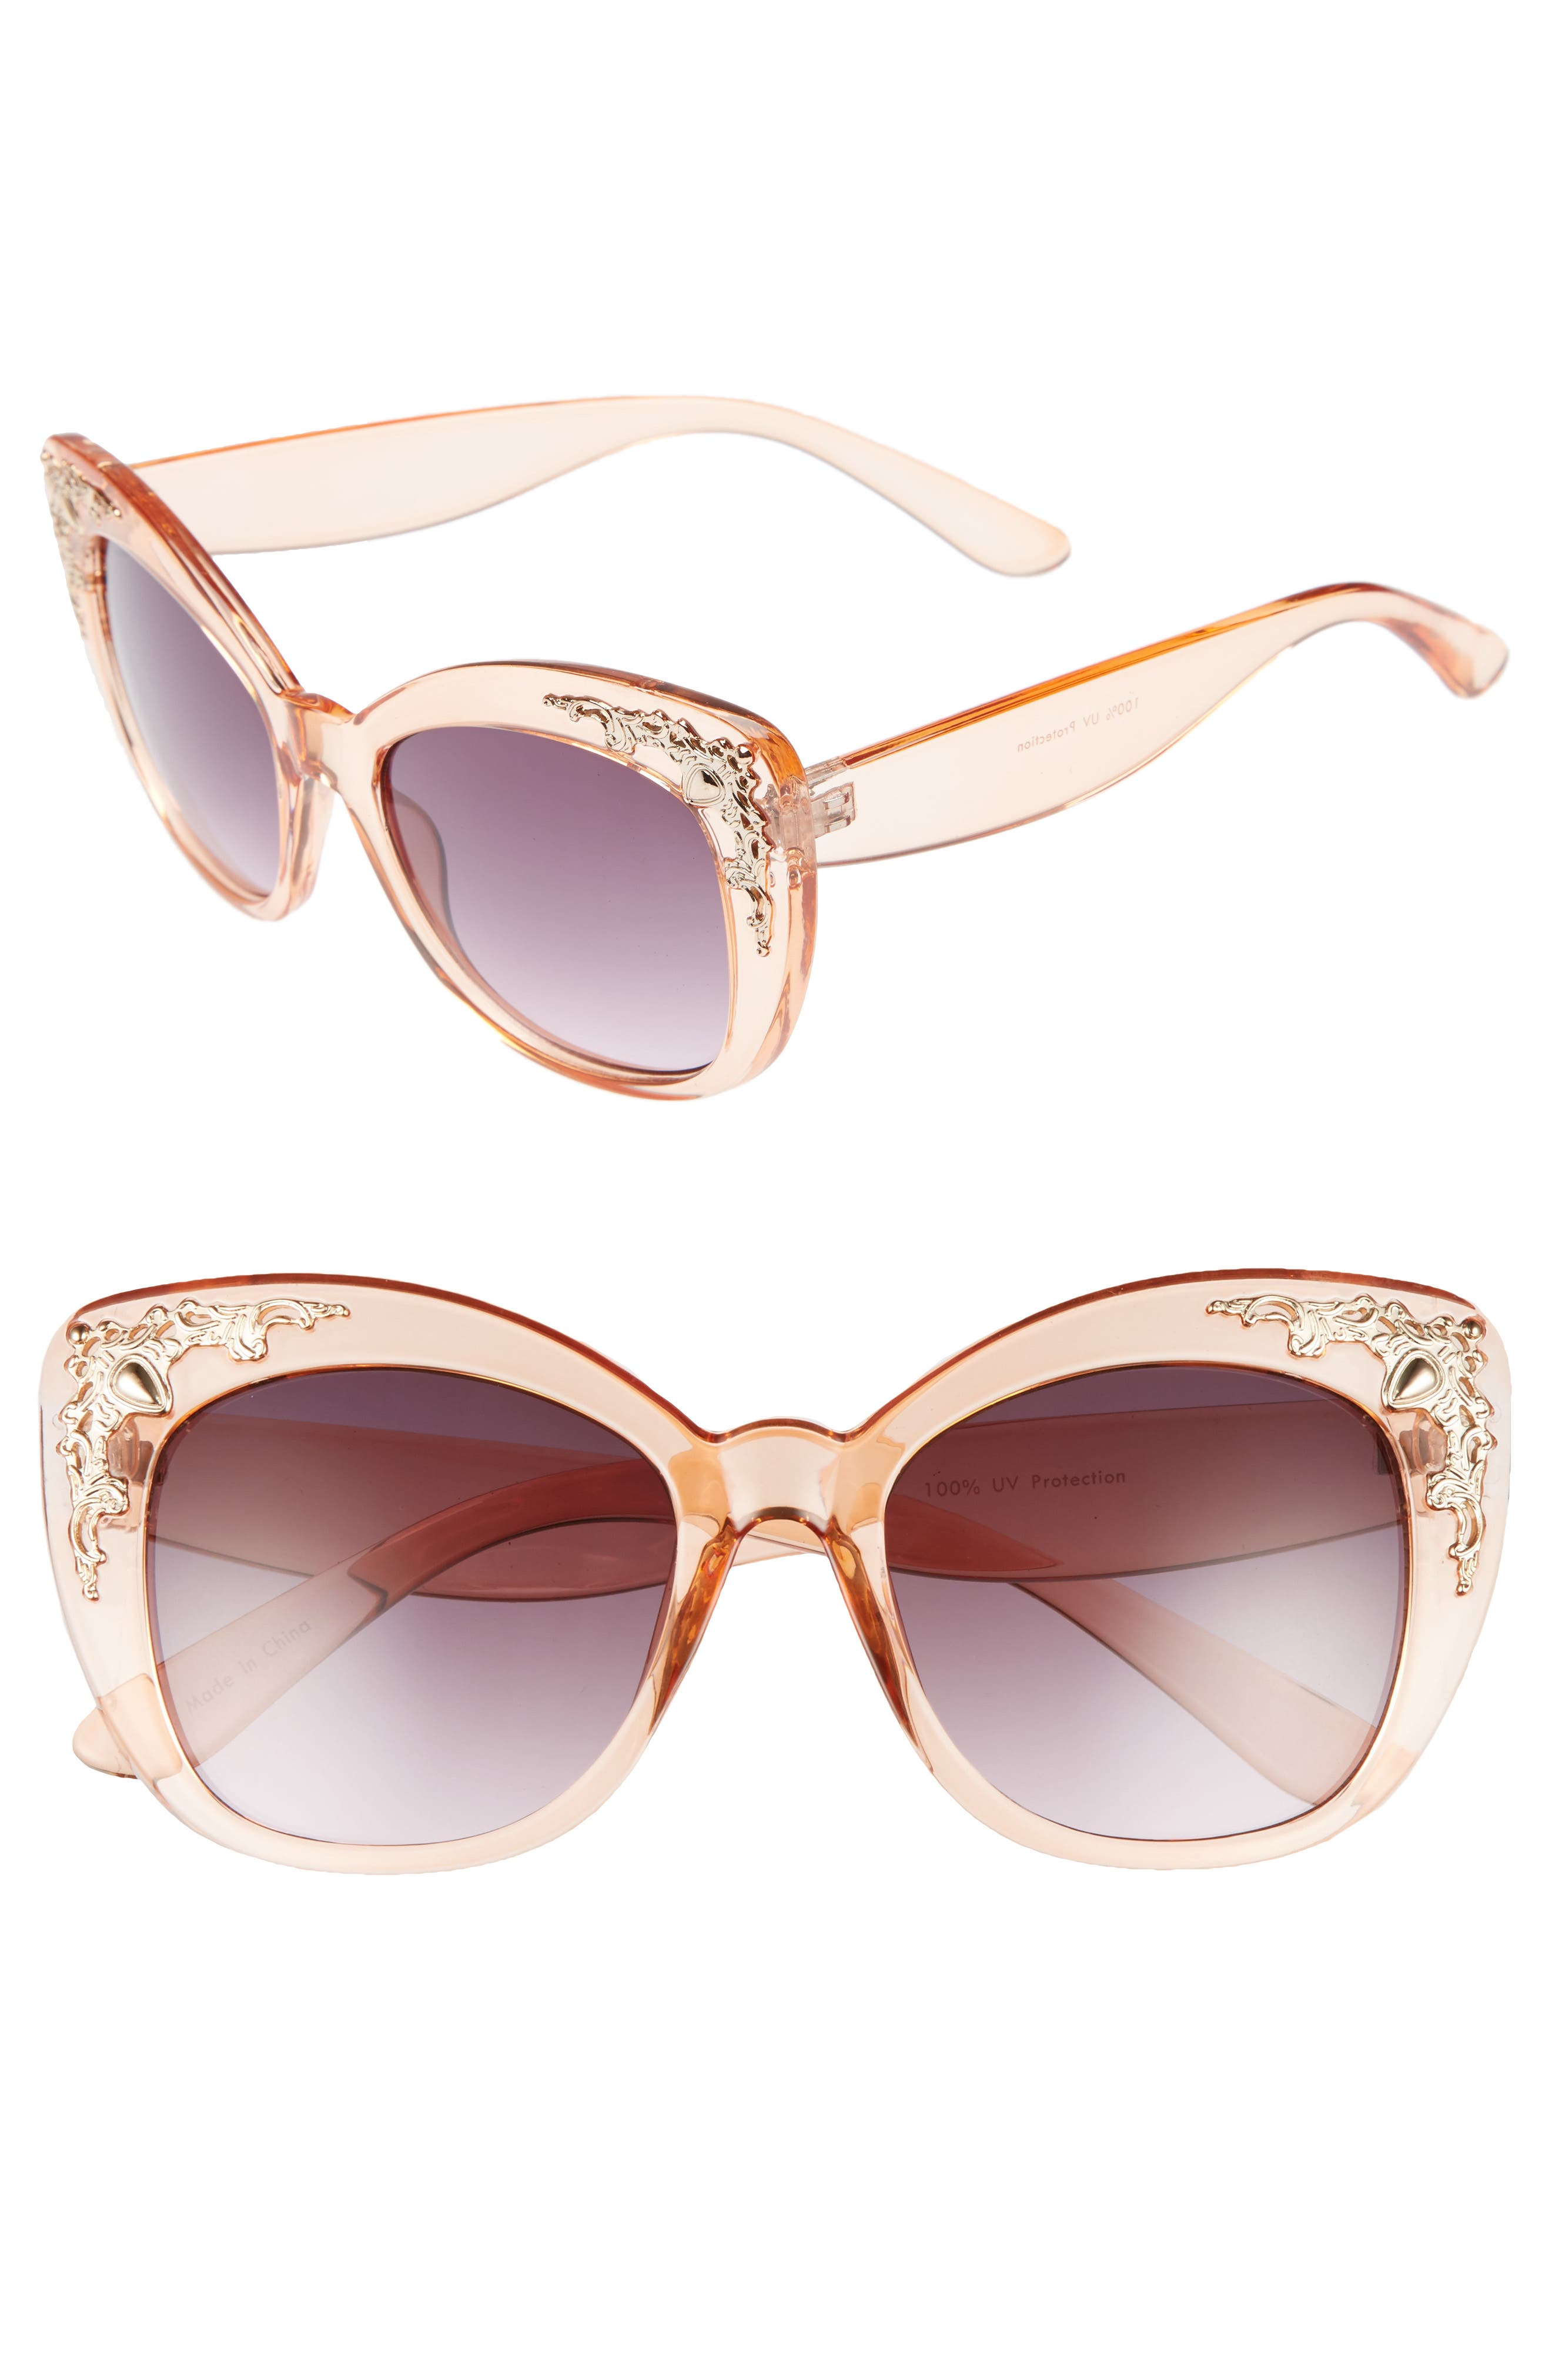 54mm Embellished Cat Eye Sunglasses,                         Main,                         color, 710